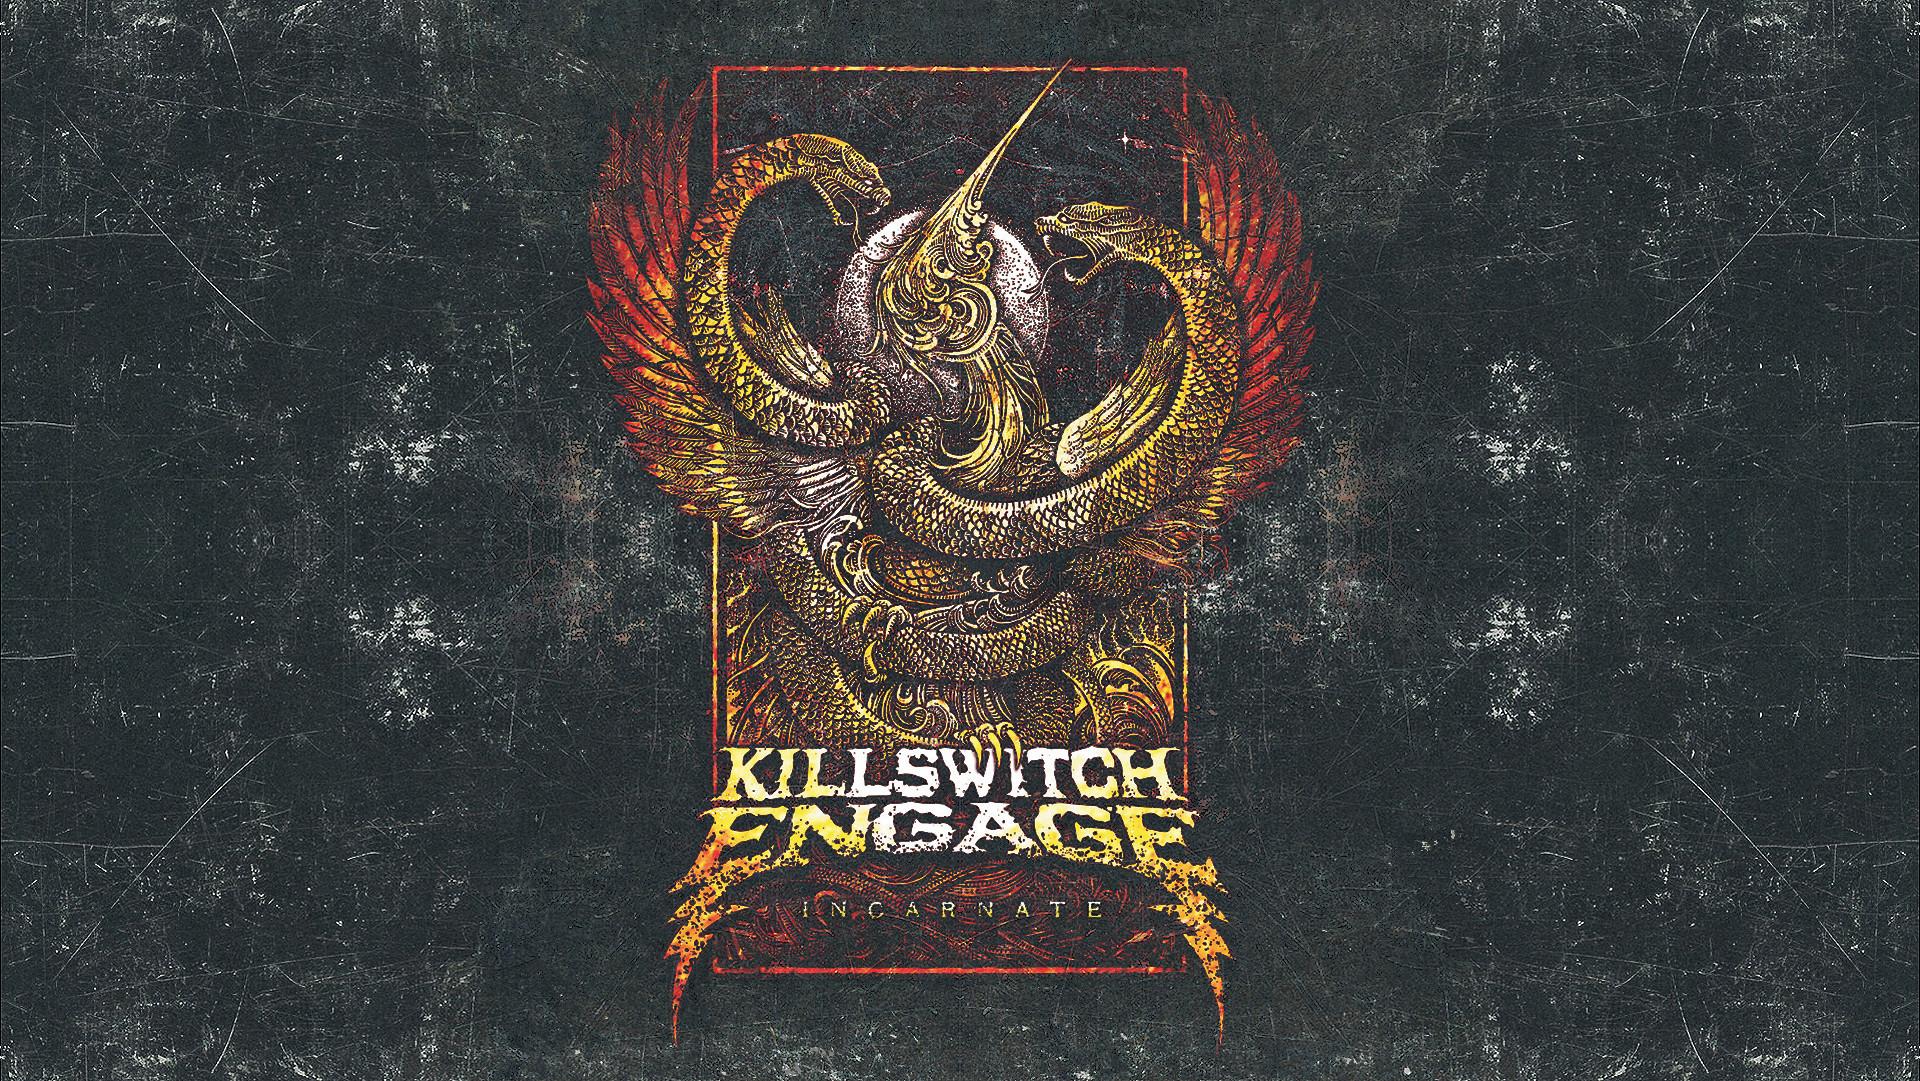 … KILLSWITCH ENGAGE: Incarnate [WALLPAPER] by disturbedkorea